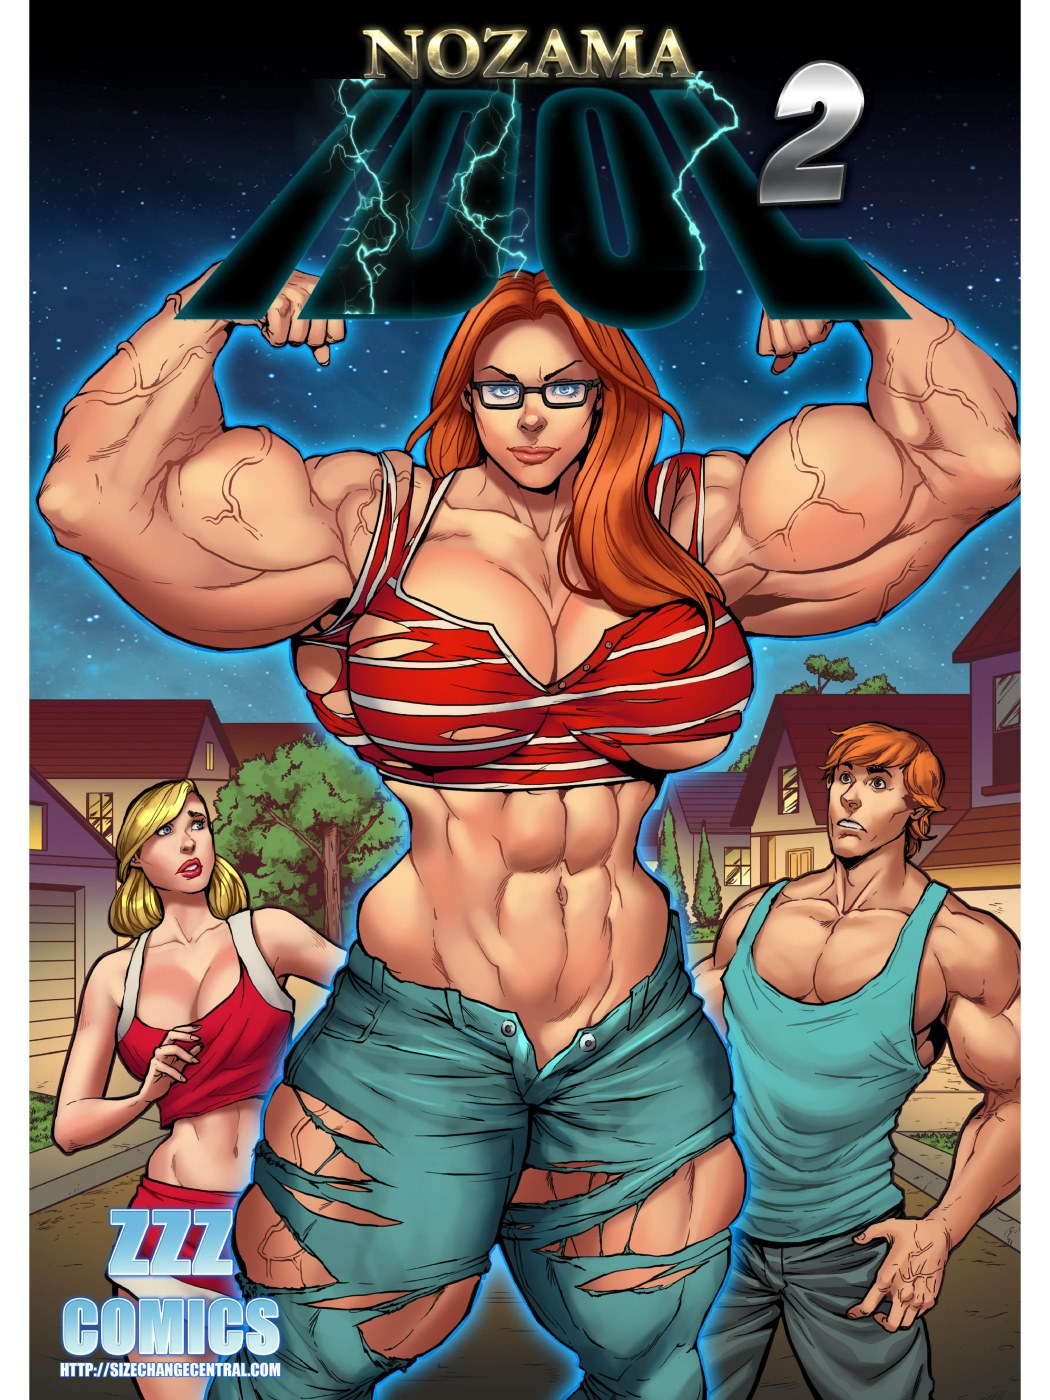 ZZZ- Nozama Idol 2 porn comics 8 muses